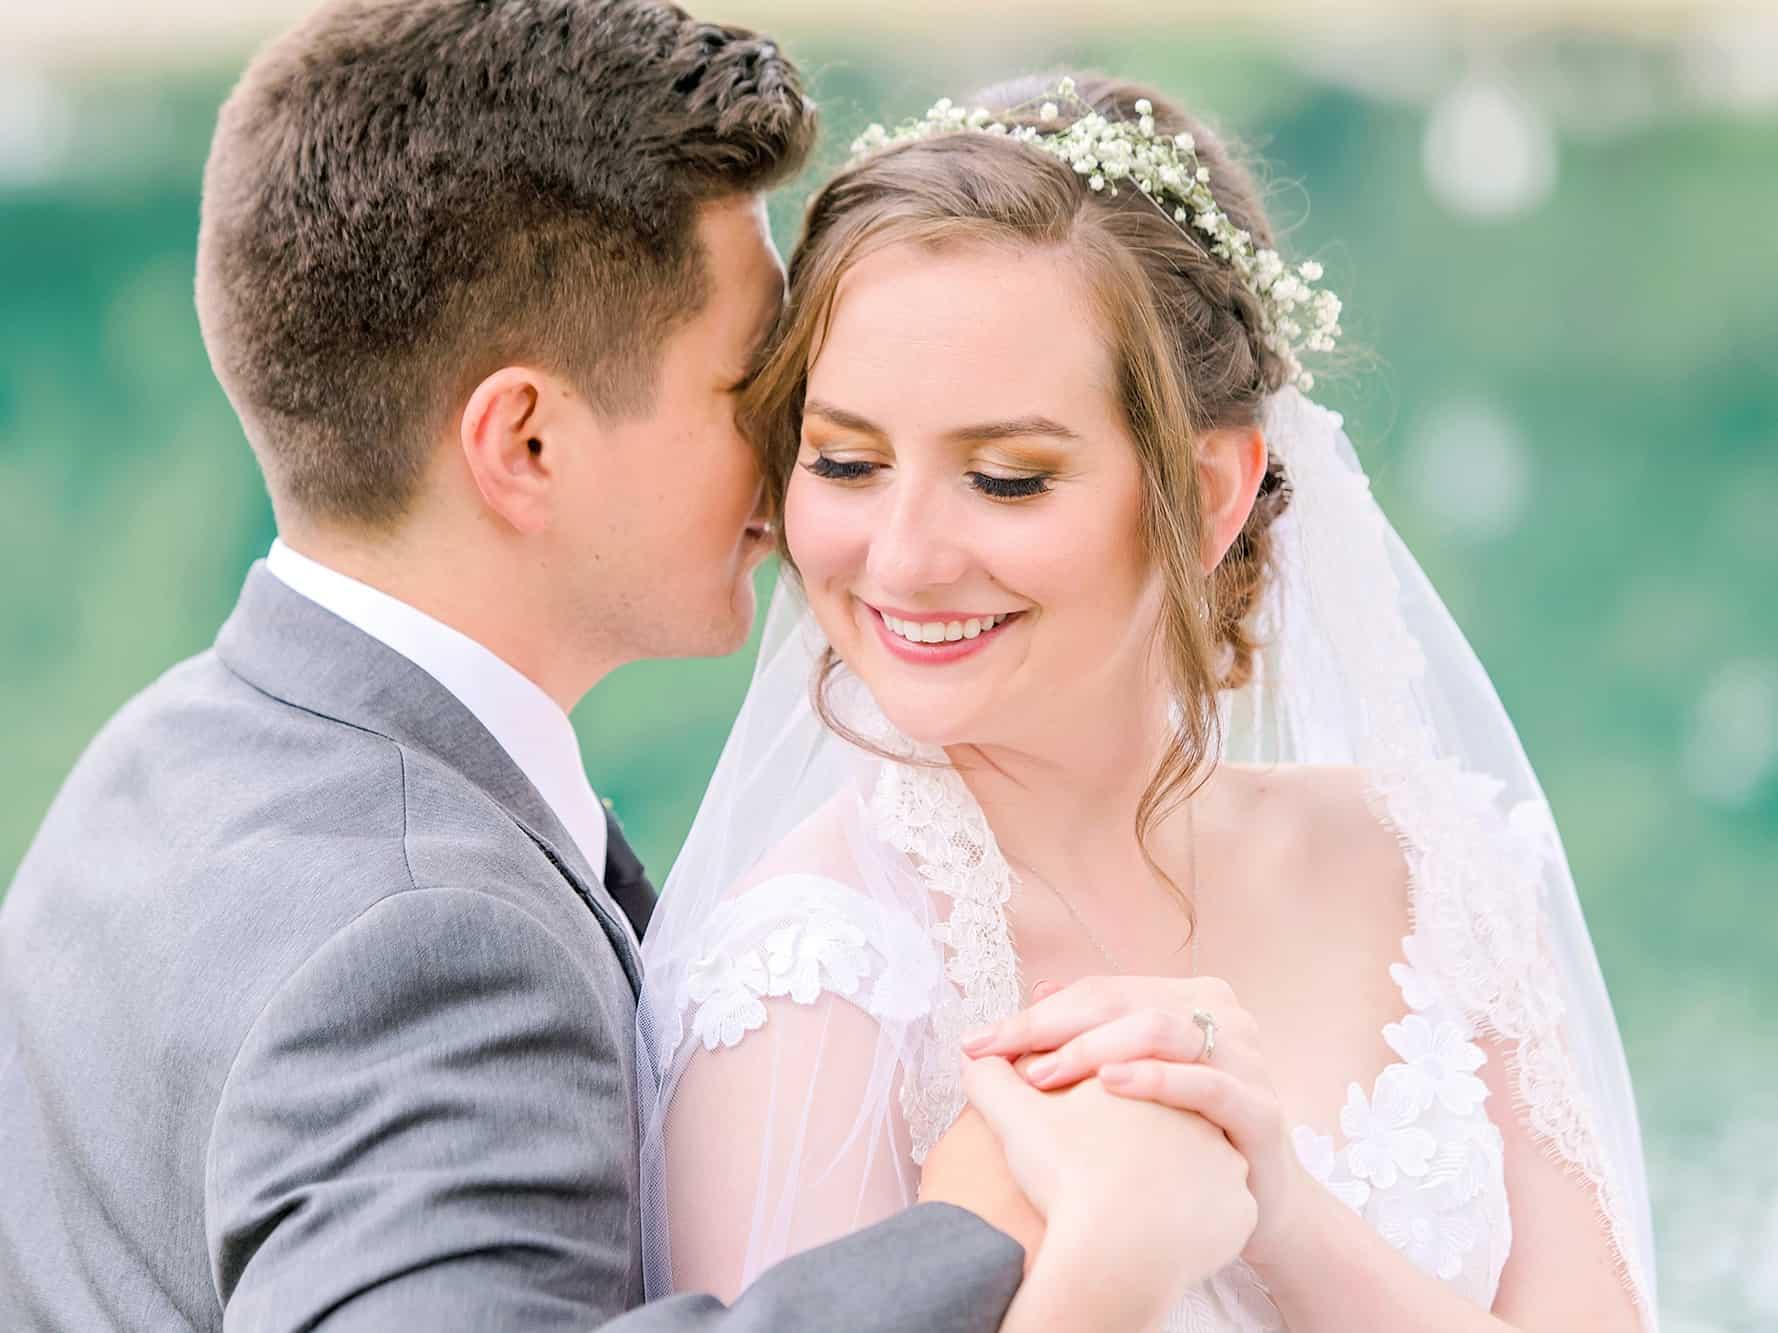 sandusky mansfield huron norwalk lorain vermilion ohio wedding photographer tiffany murray